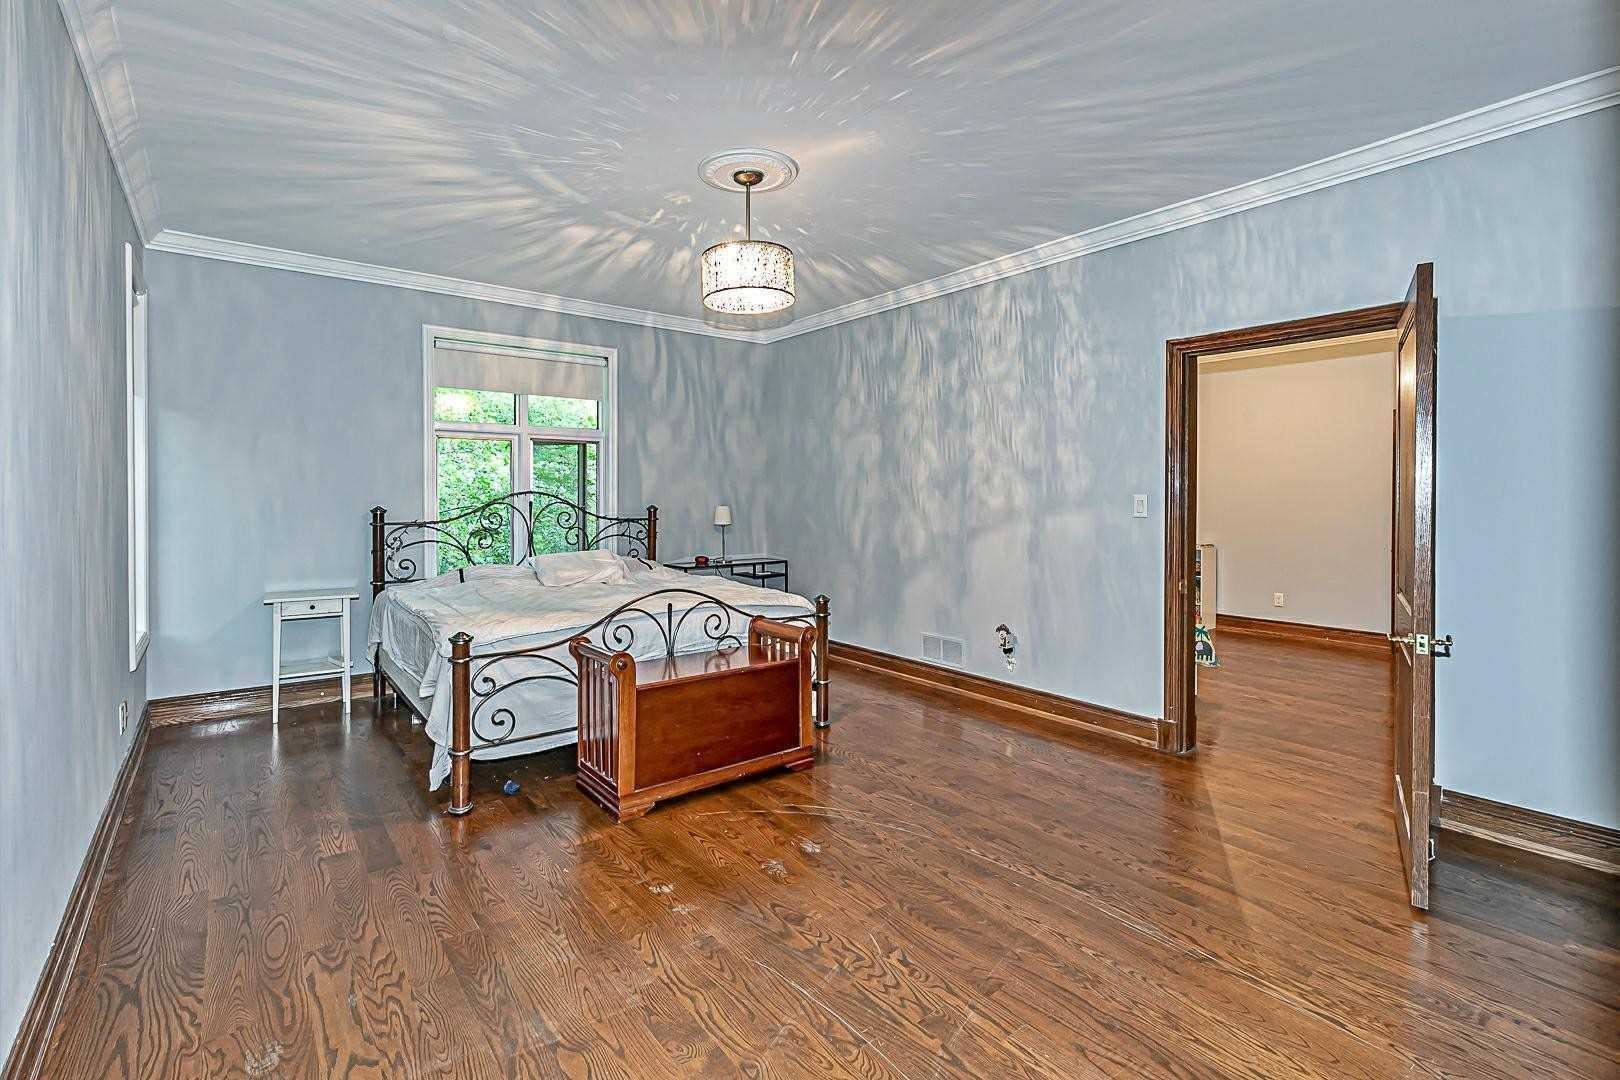 Detached house For Sale In Richmond Hill - 51 High Oak Tr, Richmond Hill, Ontario, Canada L4E3L9 , 5 Bedrooms Bedrooms, ,6 BathroomsBathrooms,Detached,For Sale,High Oak